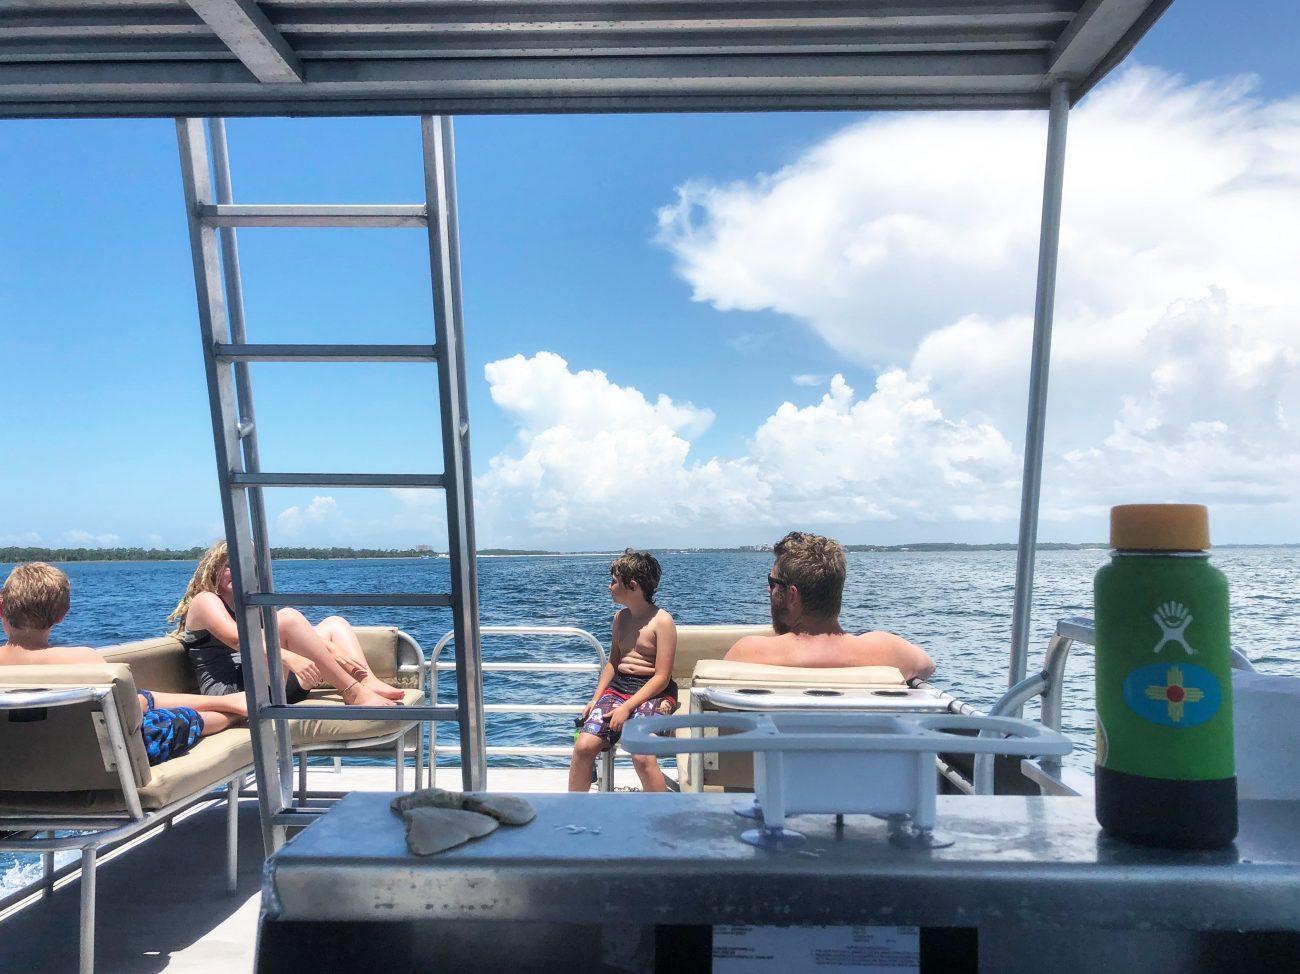 Pontoon boat in Panama City Beach, FL